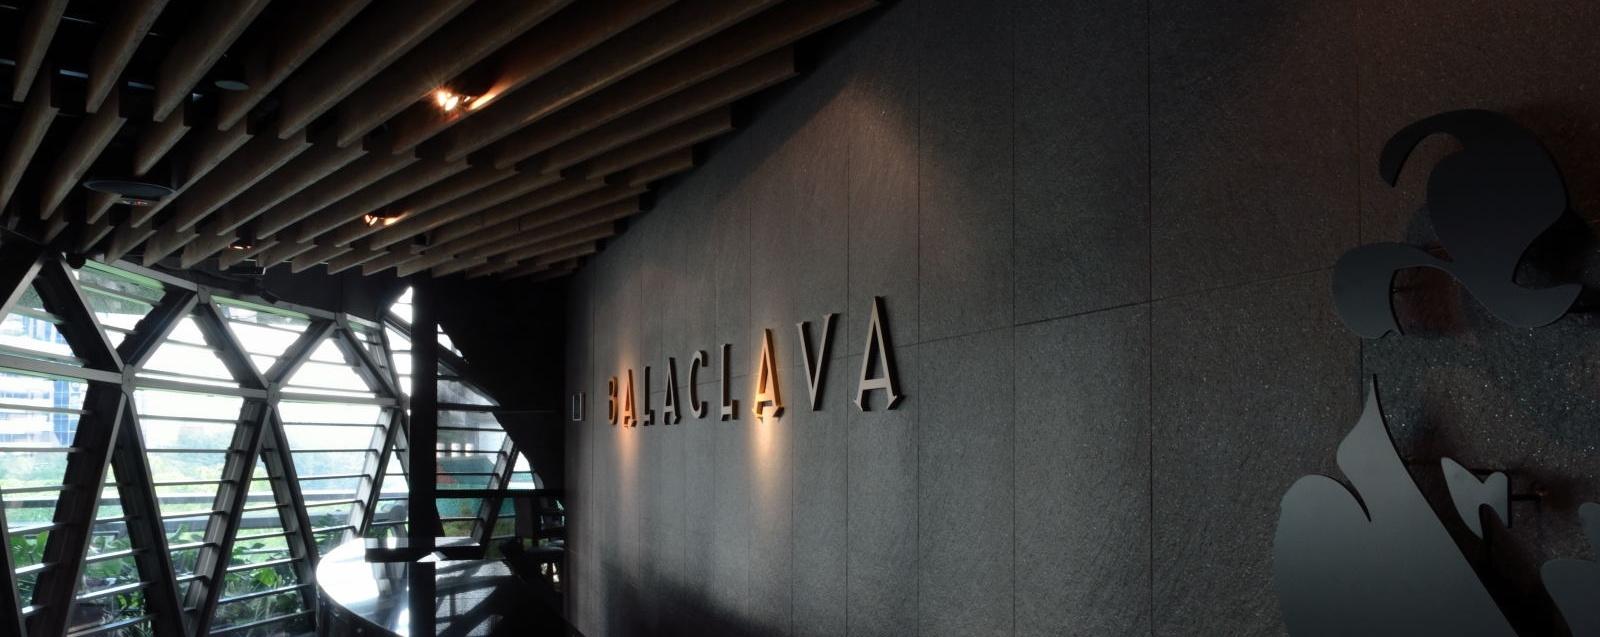 Balaclava ion